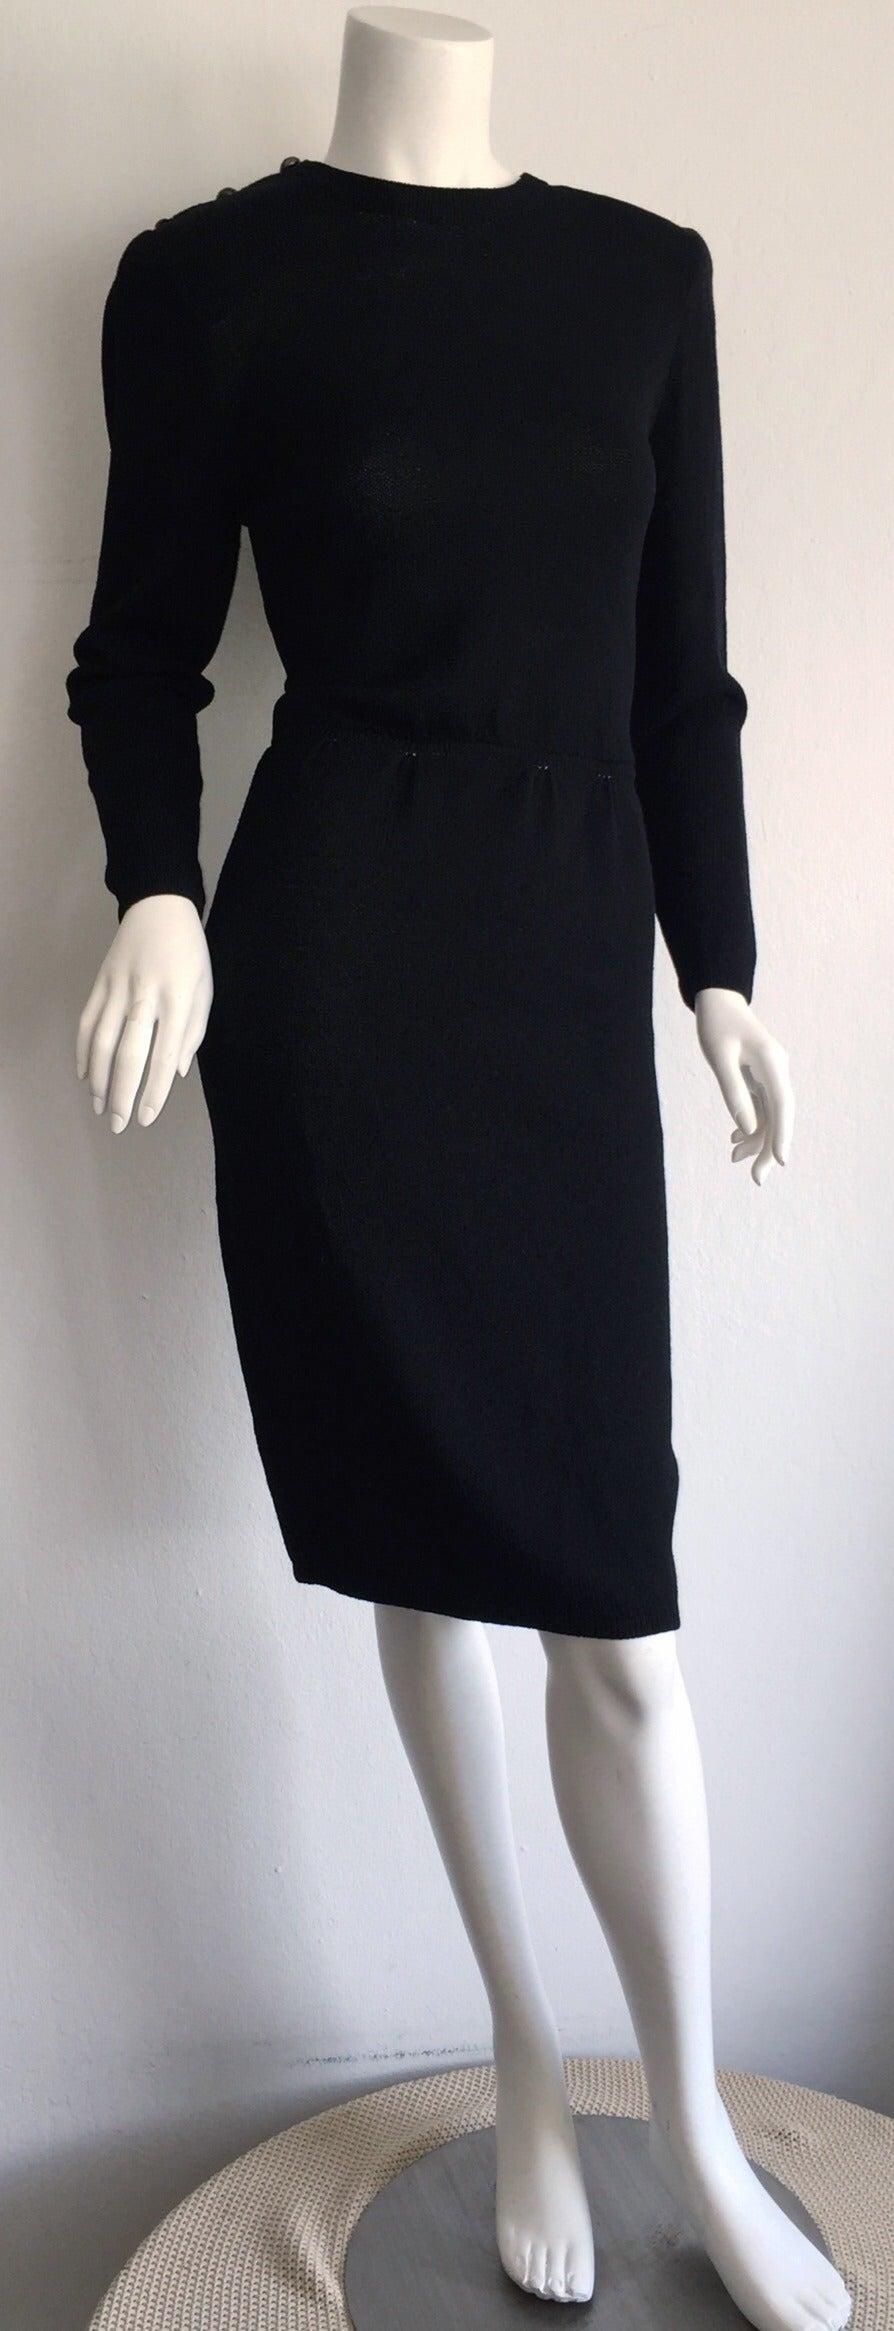 Vintage St. John Neiman Marcus Black Dress w/ Sheer Sparkle Zebra Back For Sale 2